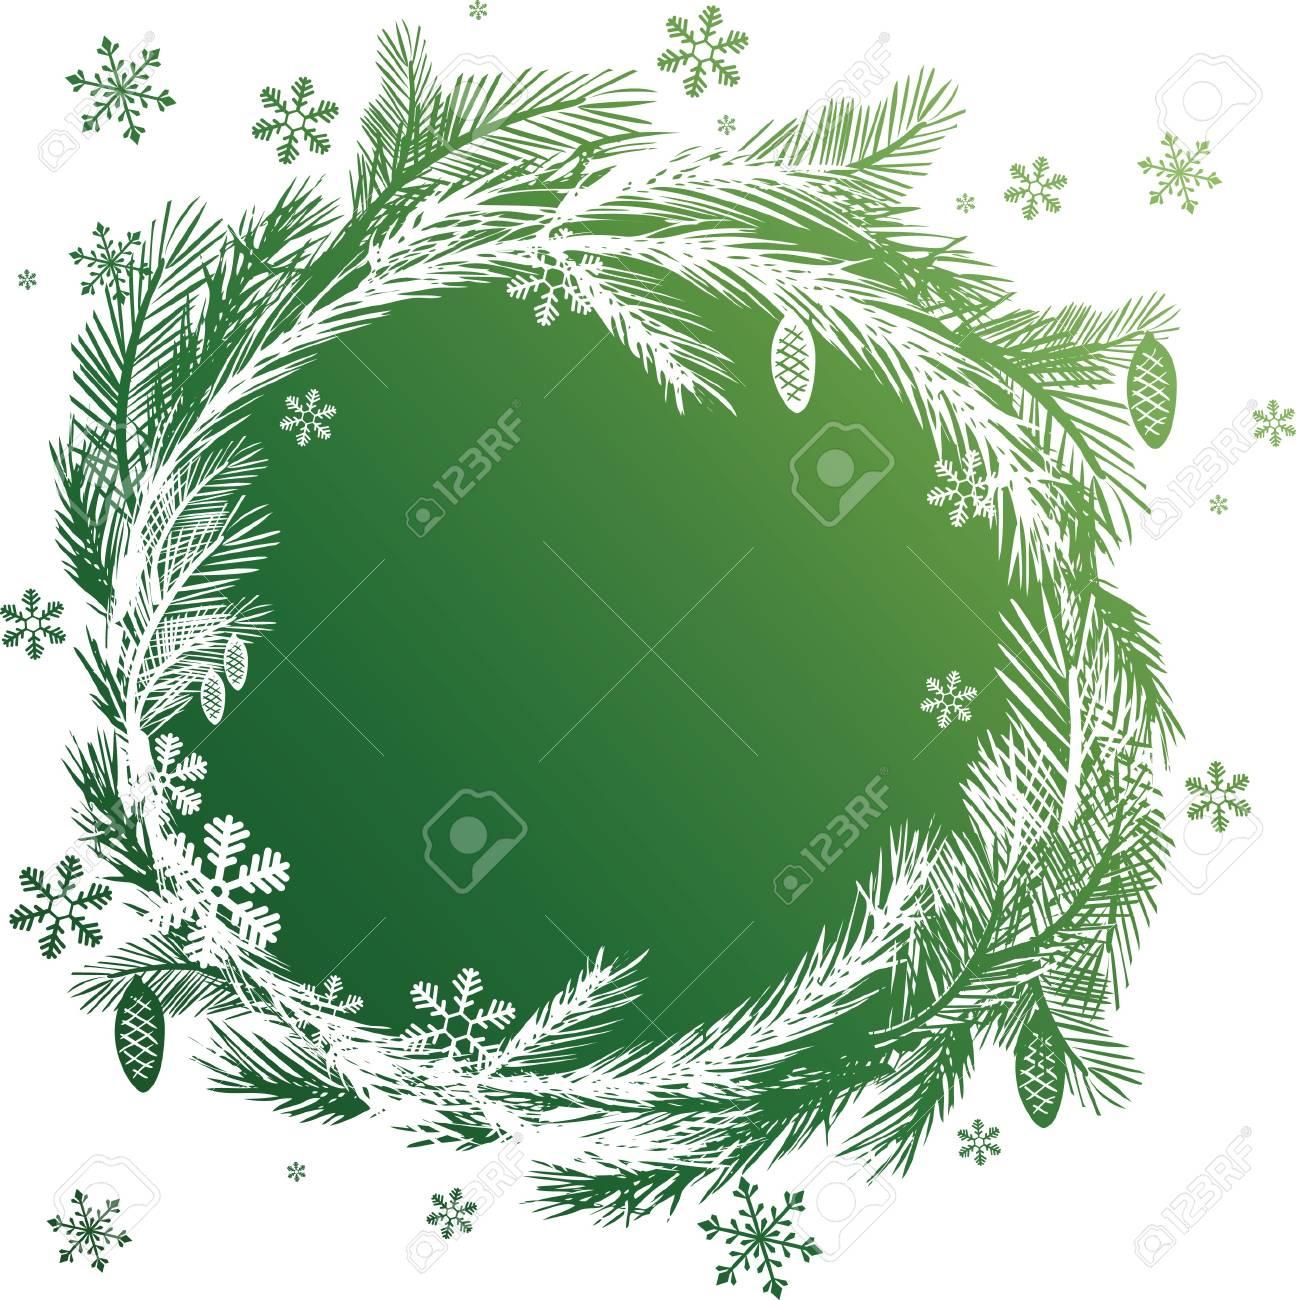 Christmas vector banners. Design element. Stock Vector - 8388255